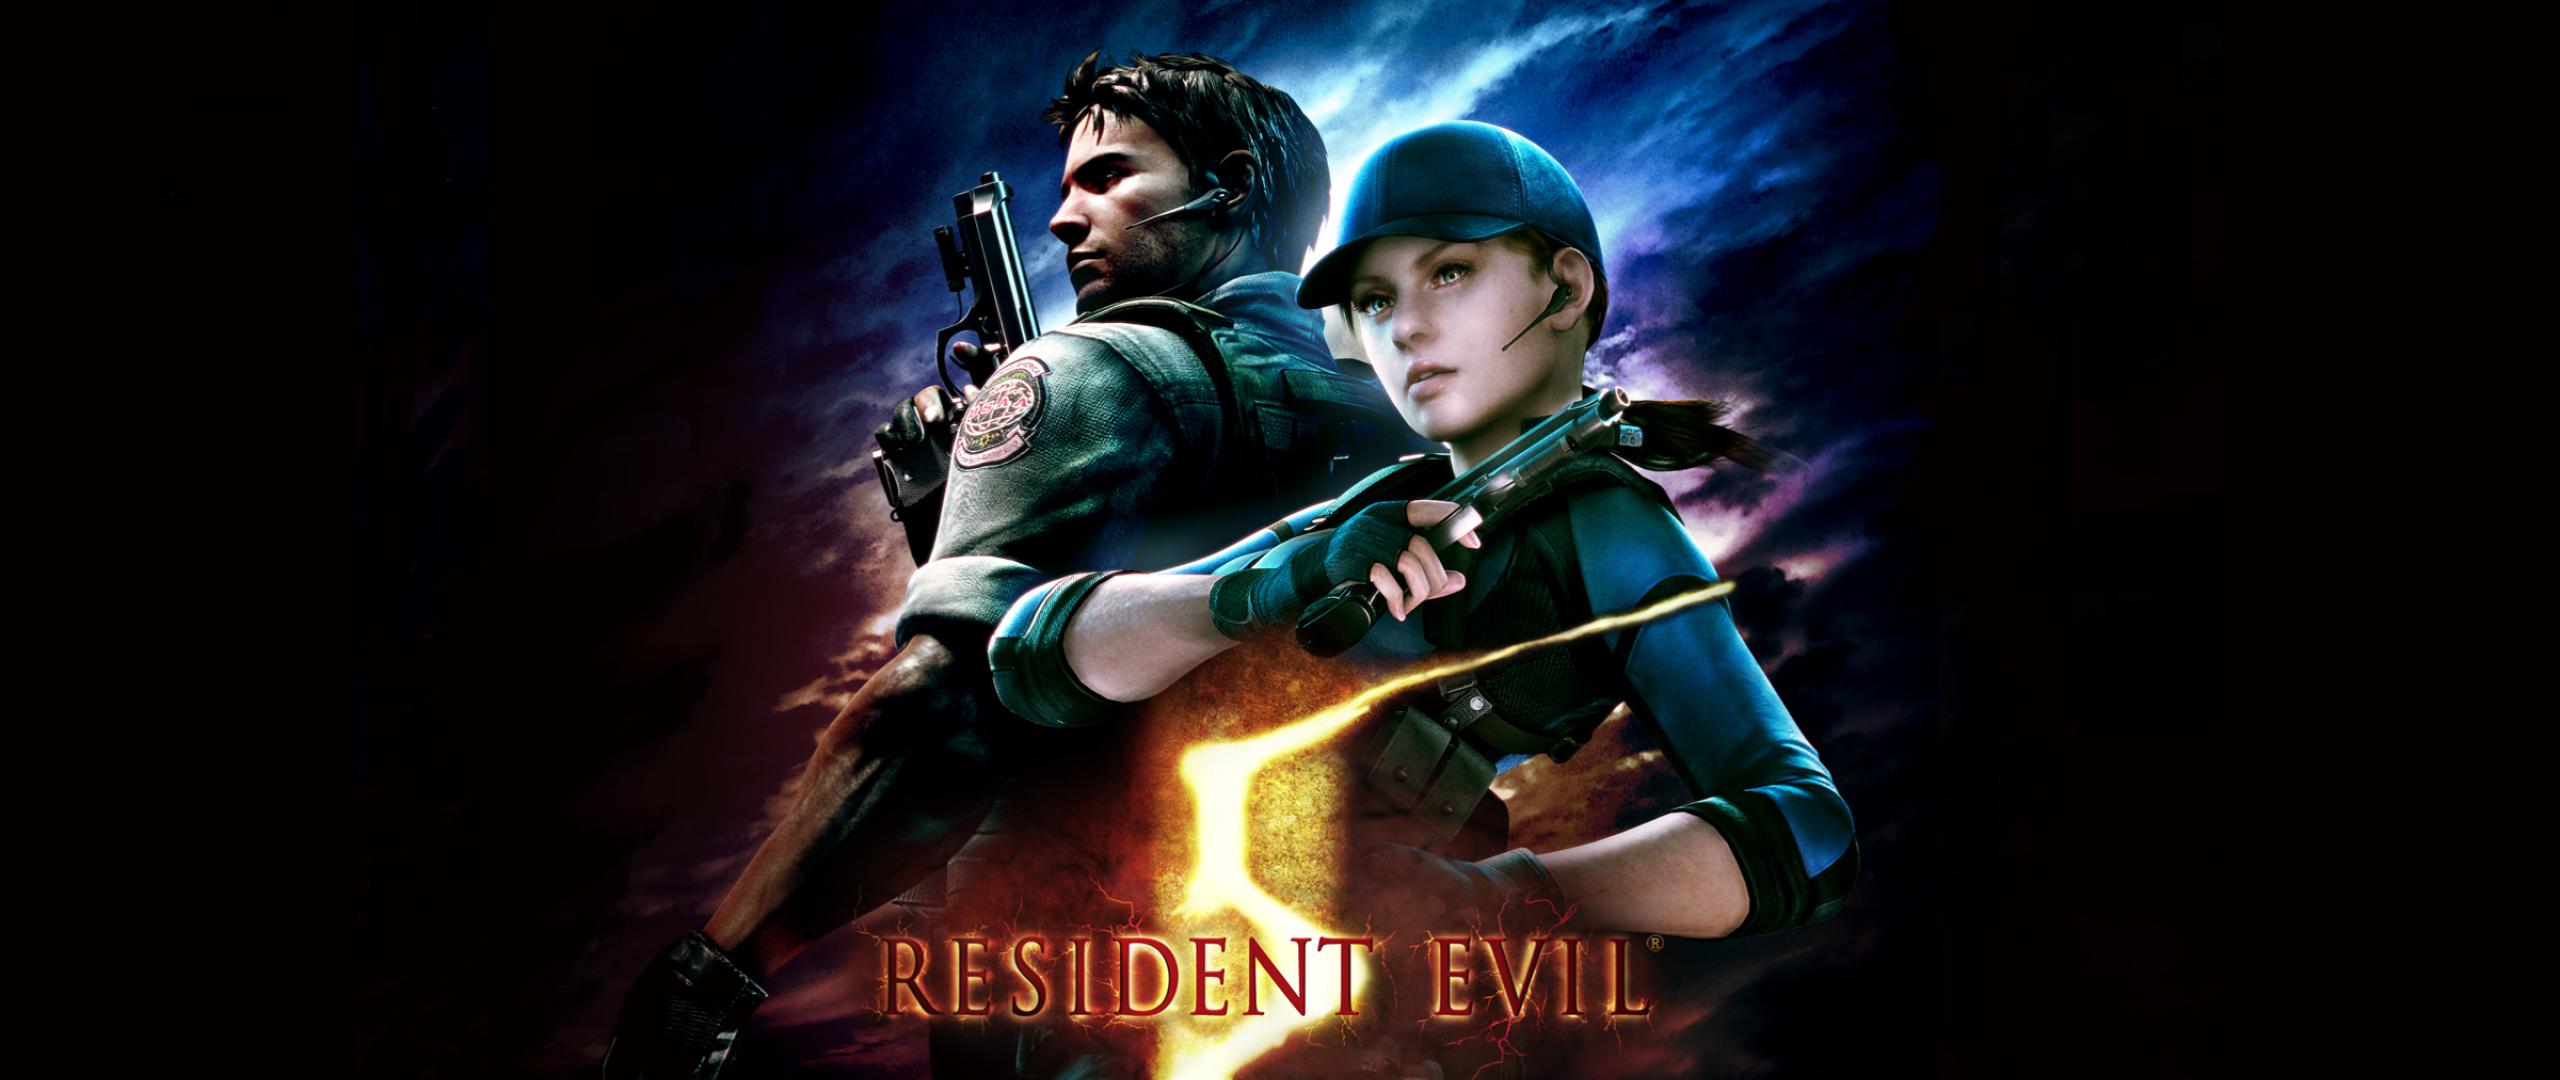 2560x1080 Resident Evil 5 2560x1080 Resolution Wallpaper Hd Games